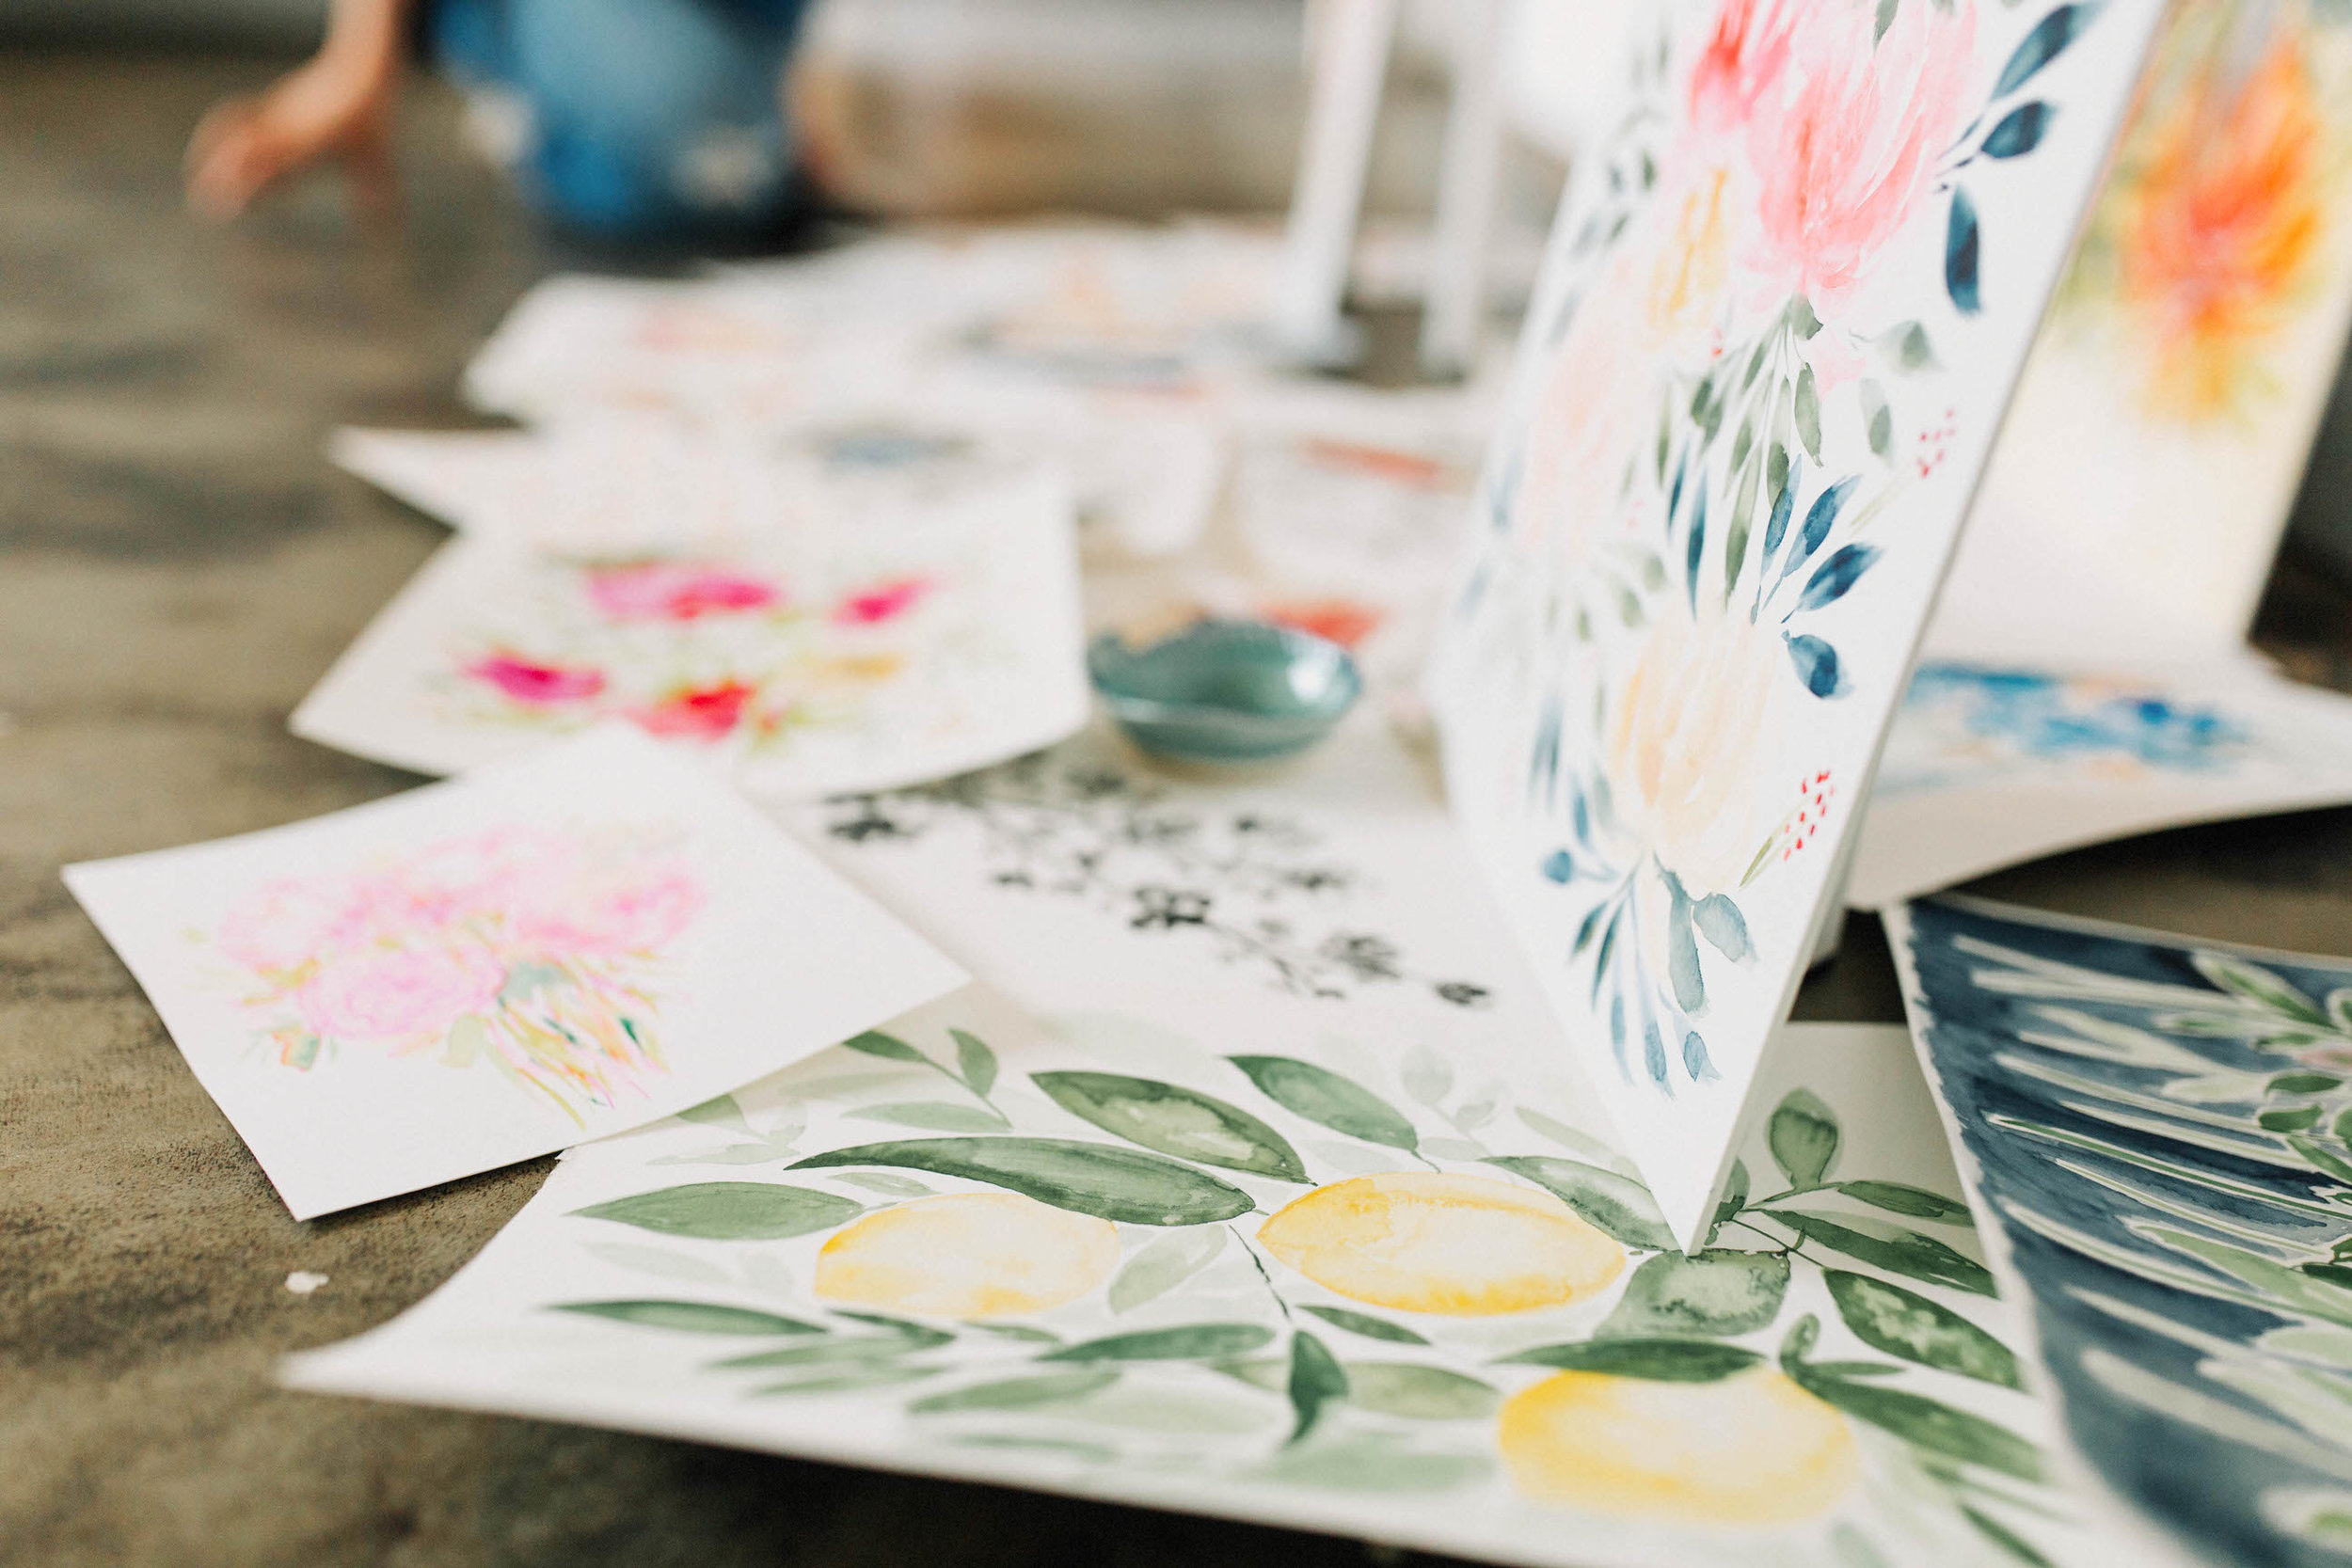 BLOG | My Favourite Watercolor Supplies: Victoria Bilsborough